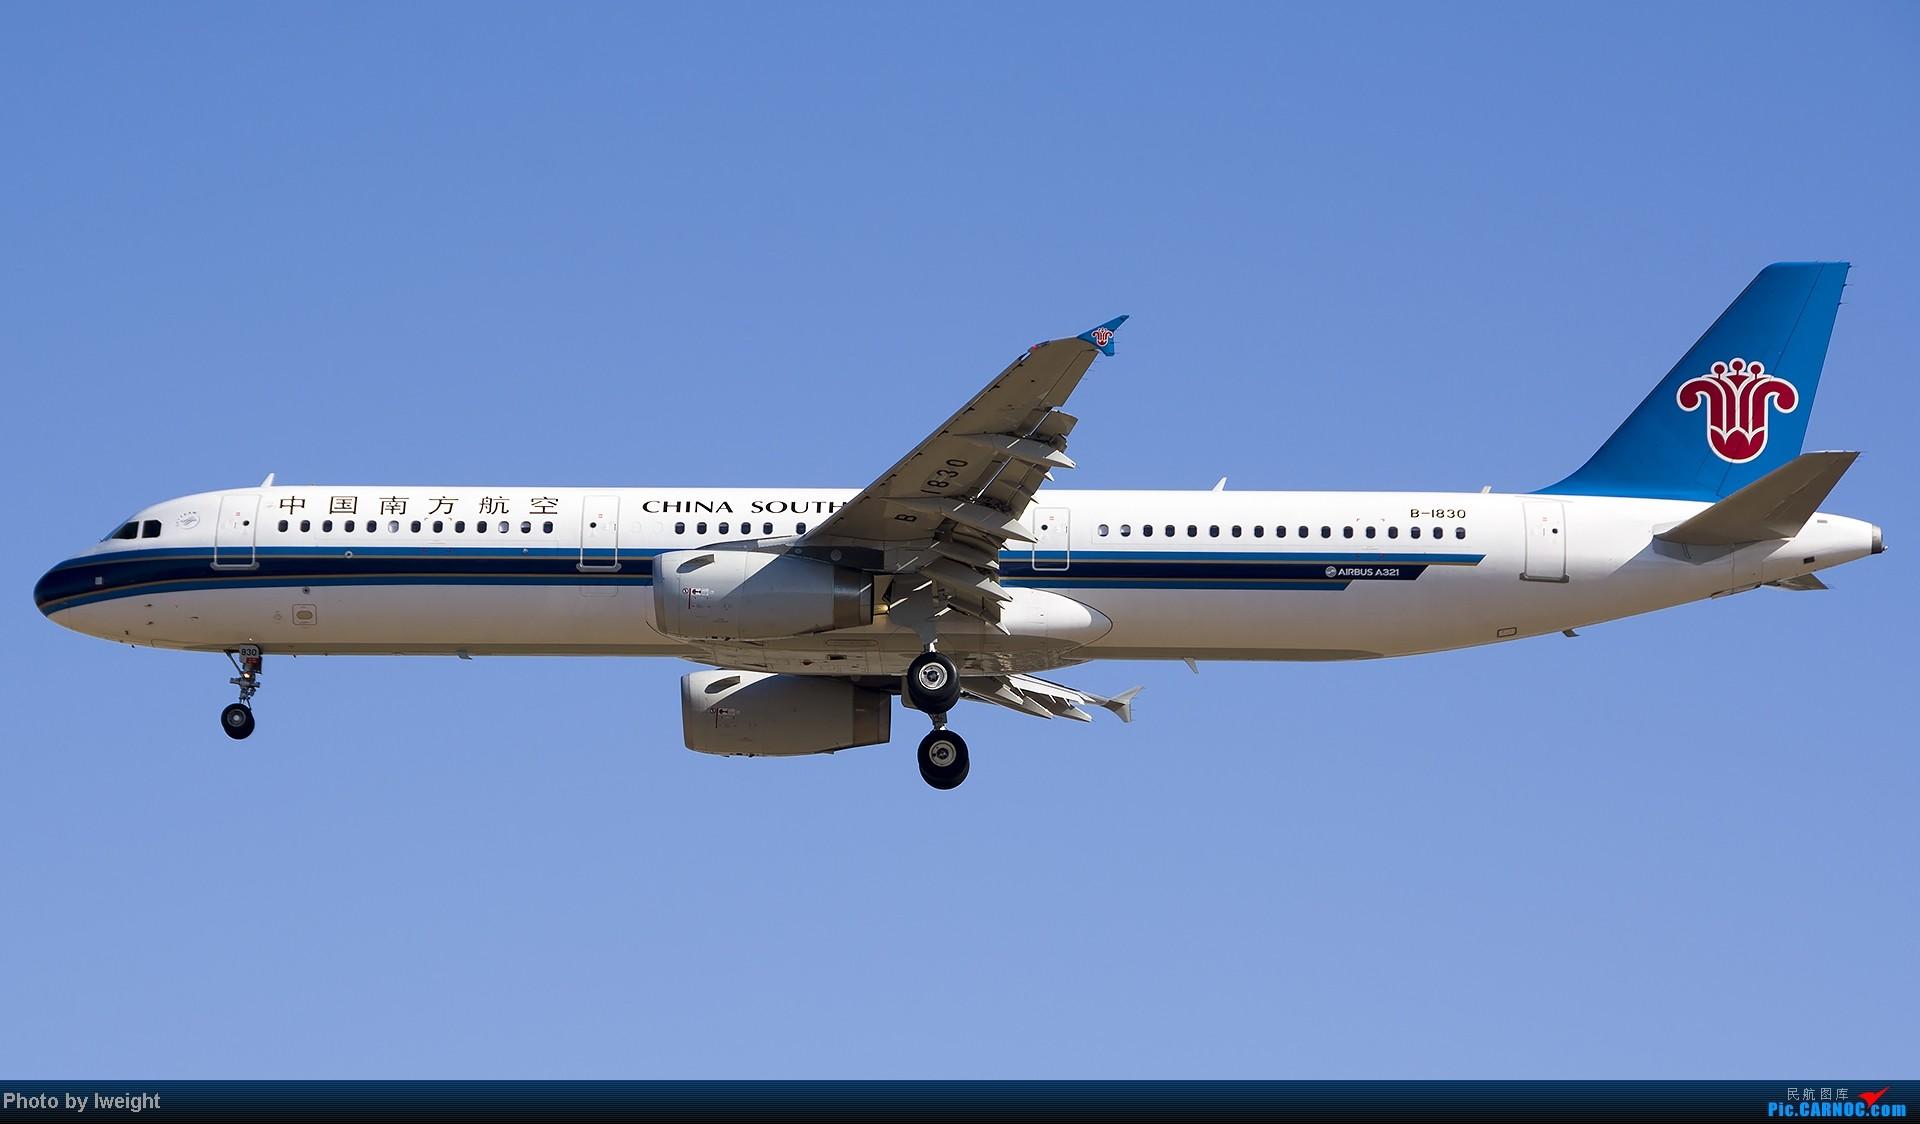 Re:[原创]抓住APEC蓝的尾巴,再拍上一组 AIRBUS A321-200 B-1830 中国北京首都机场